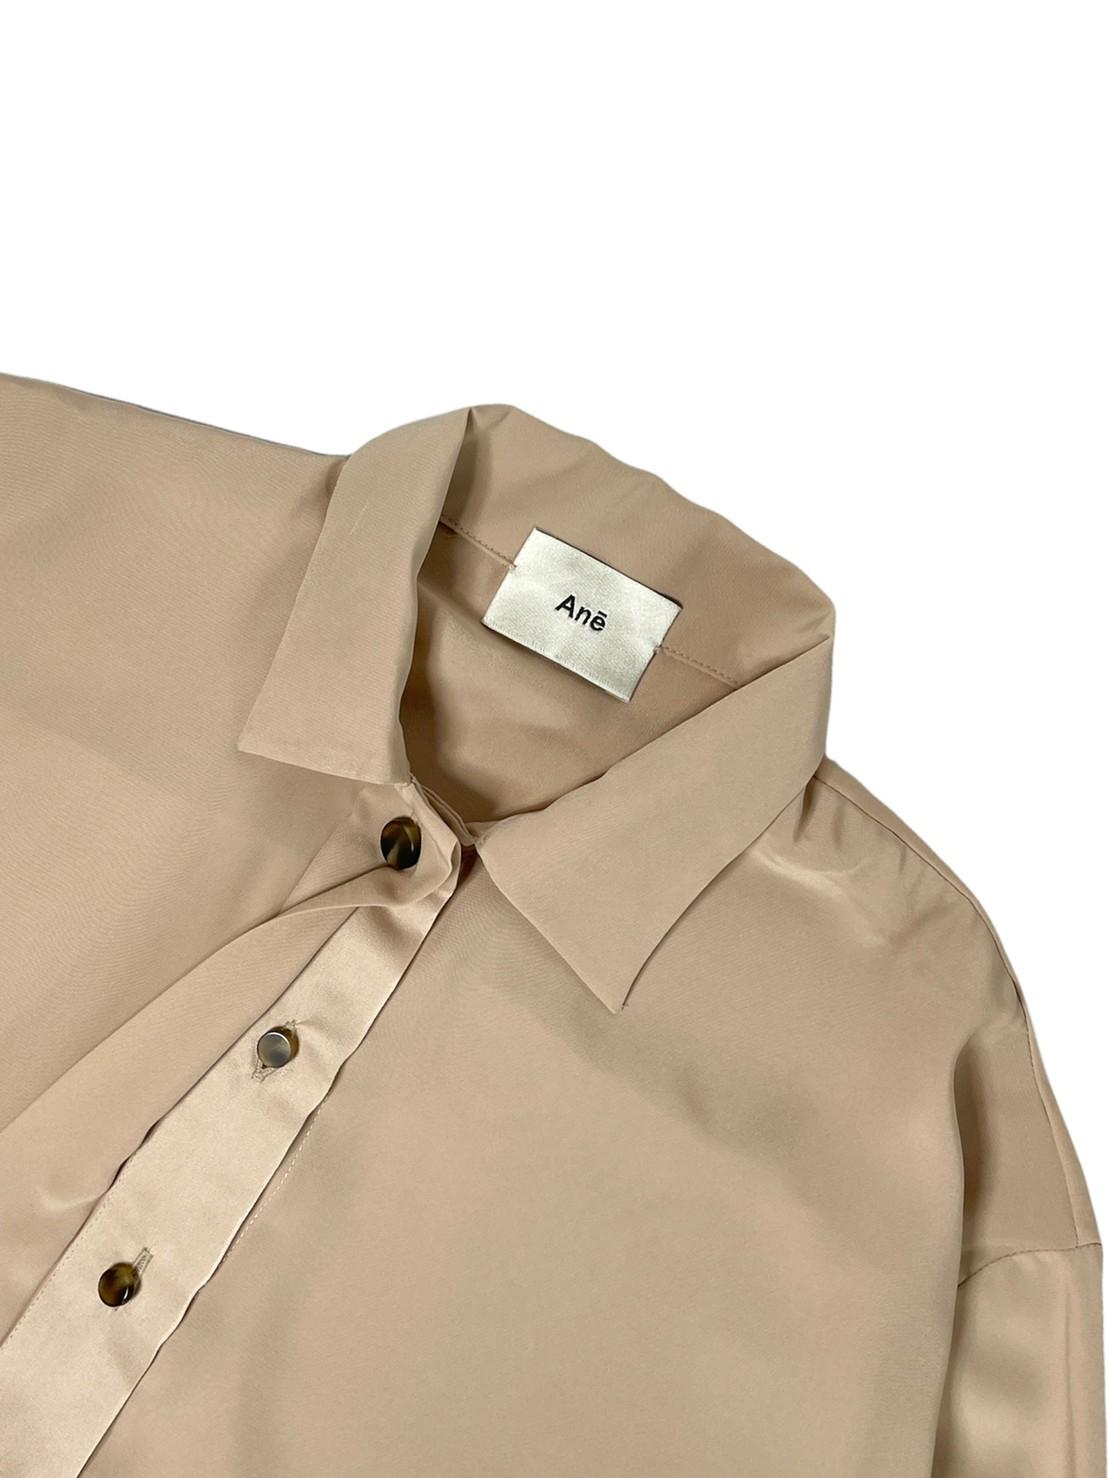 Ane cote shirt (champagne)